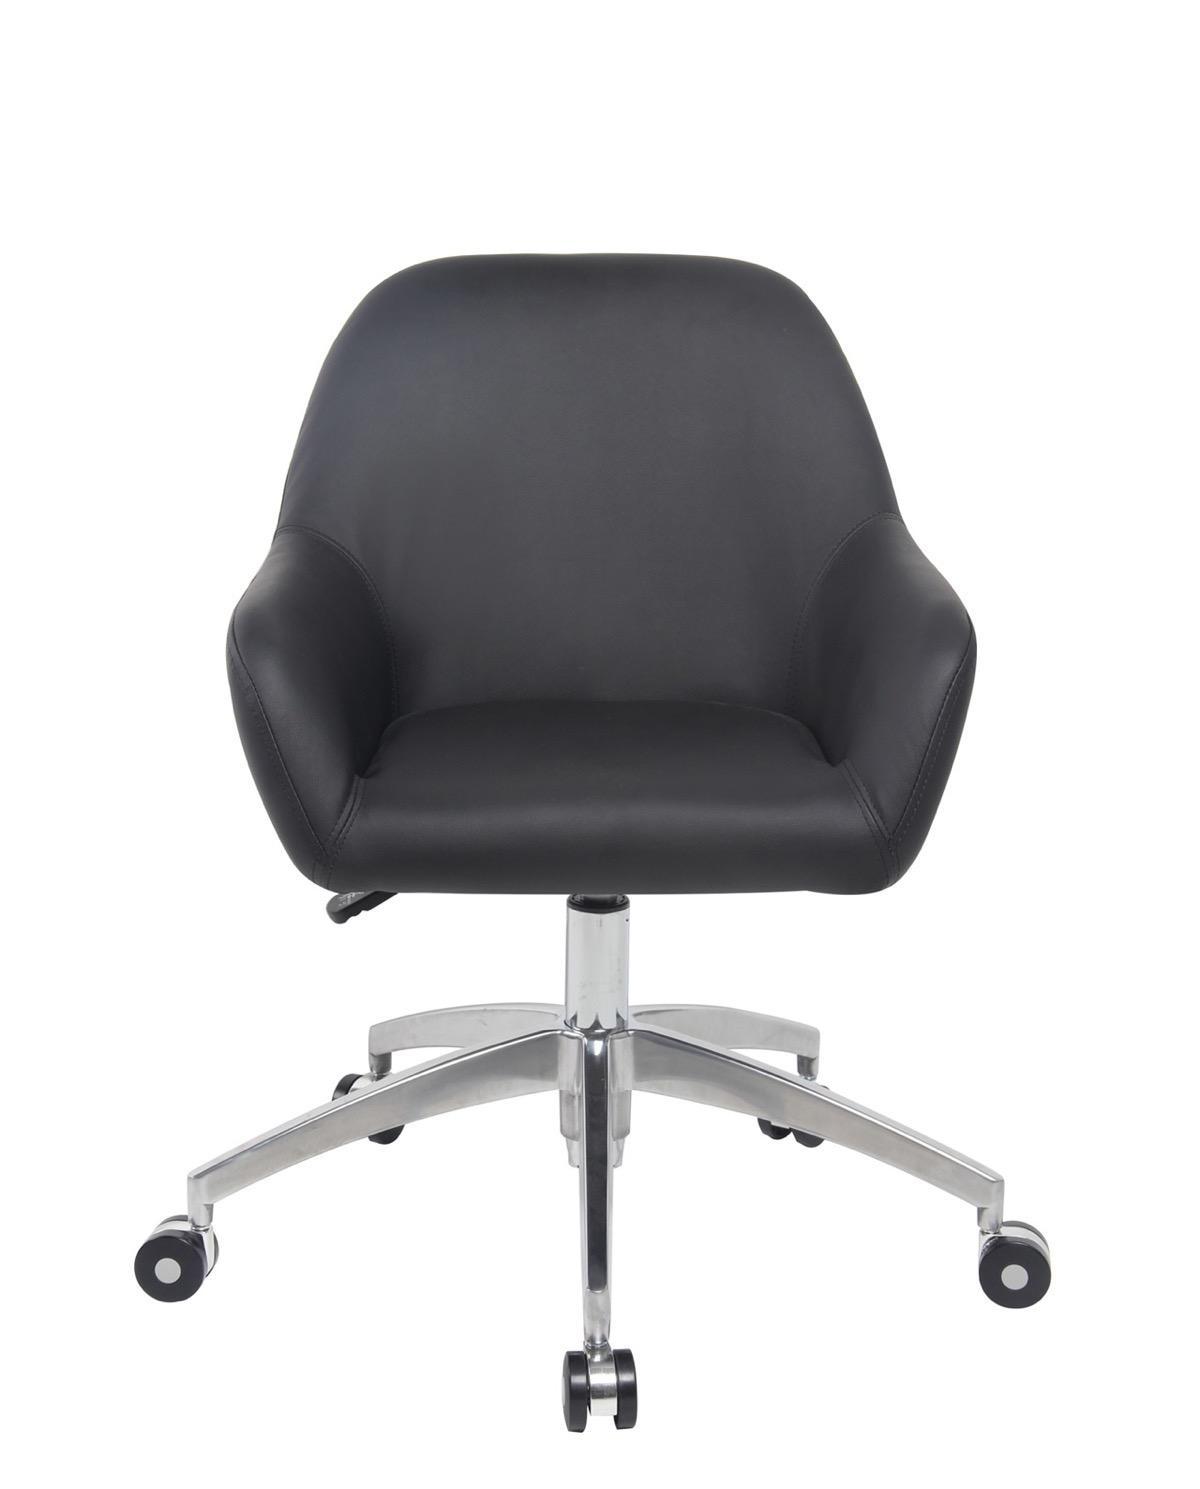 capa chaise de bureau design pi tement alu poli. Black Bedroom Furniture Sets. Home Design Ideas